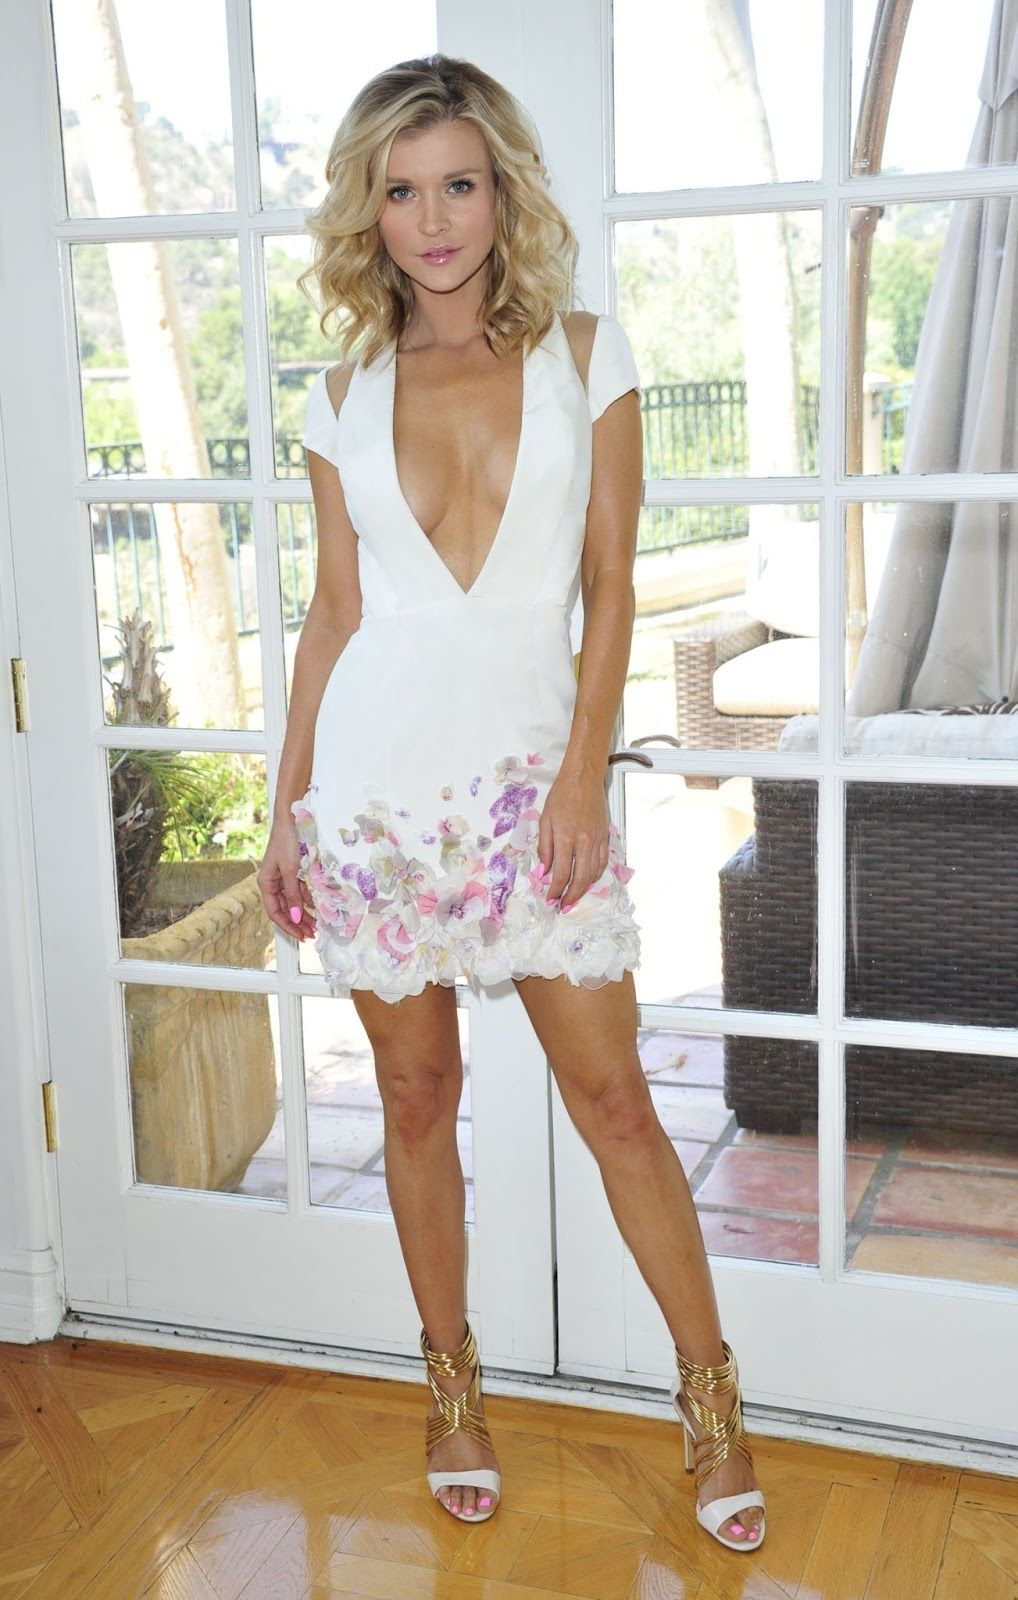 Image result for joanna krupa wiki | Beautiful Women | Pinterest ...